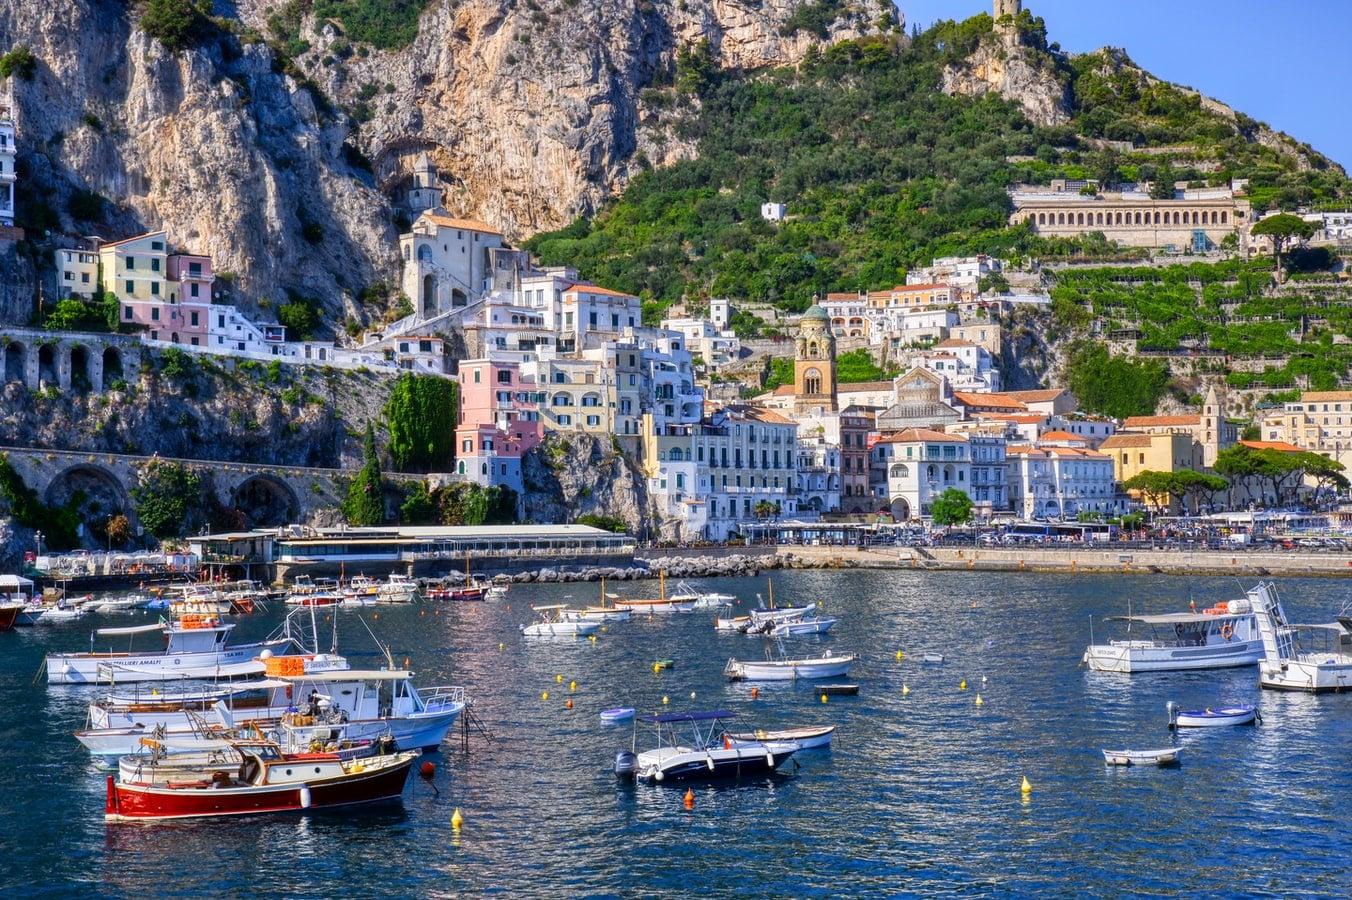 Amalfi veduta da mare